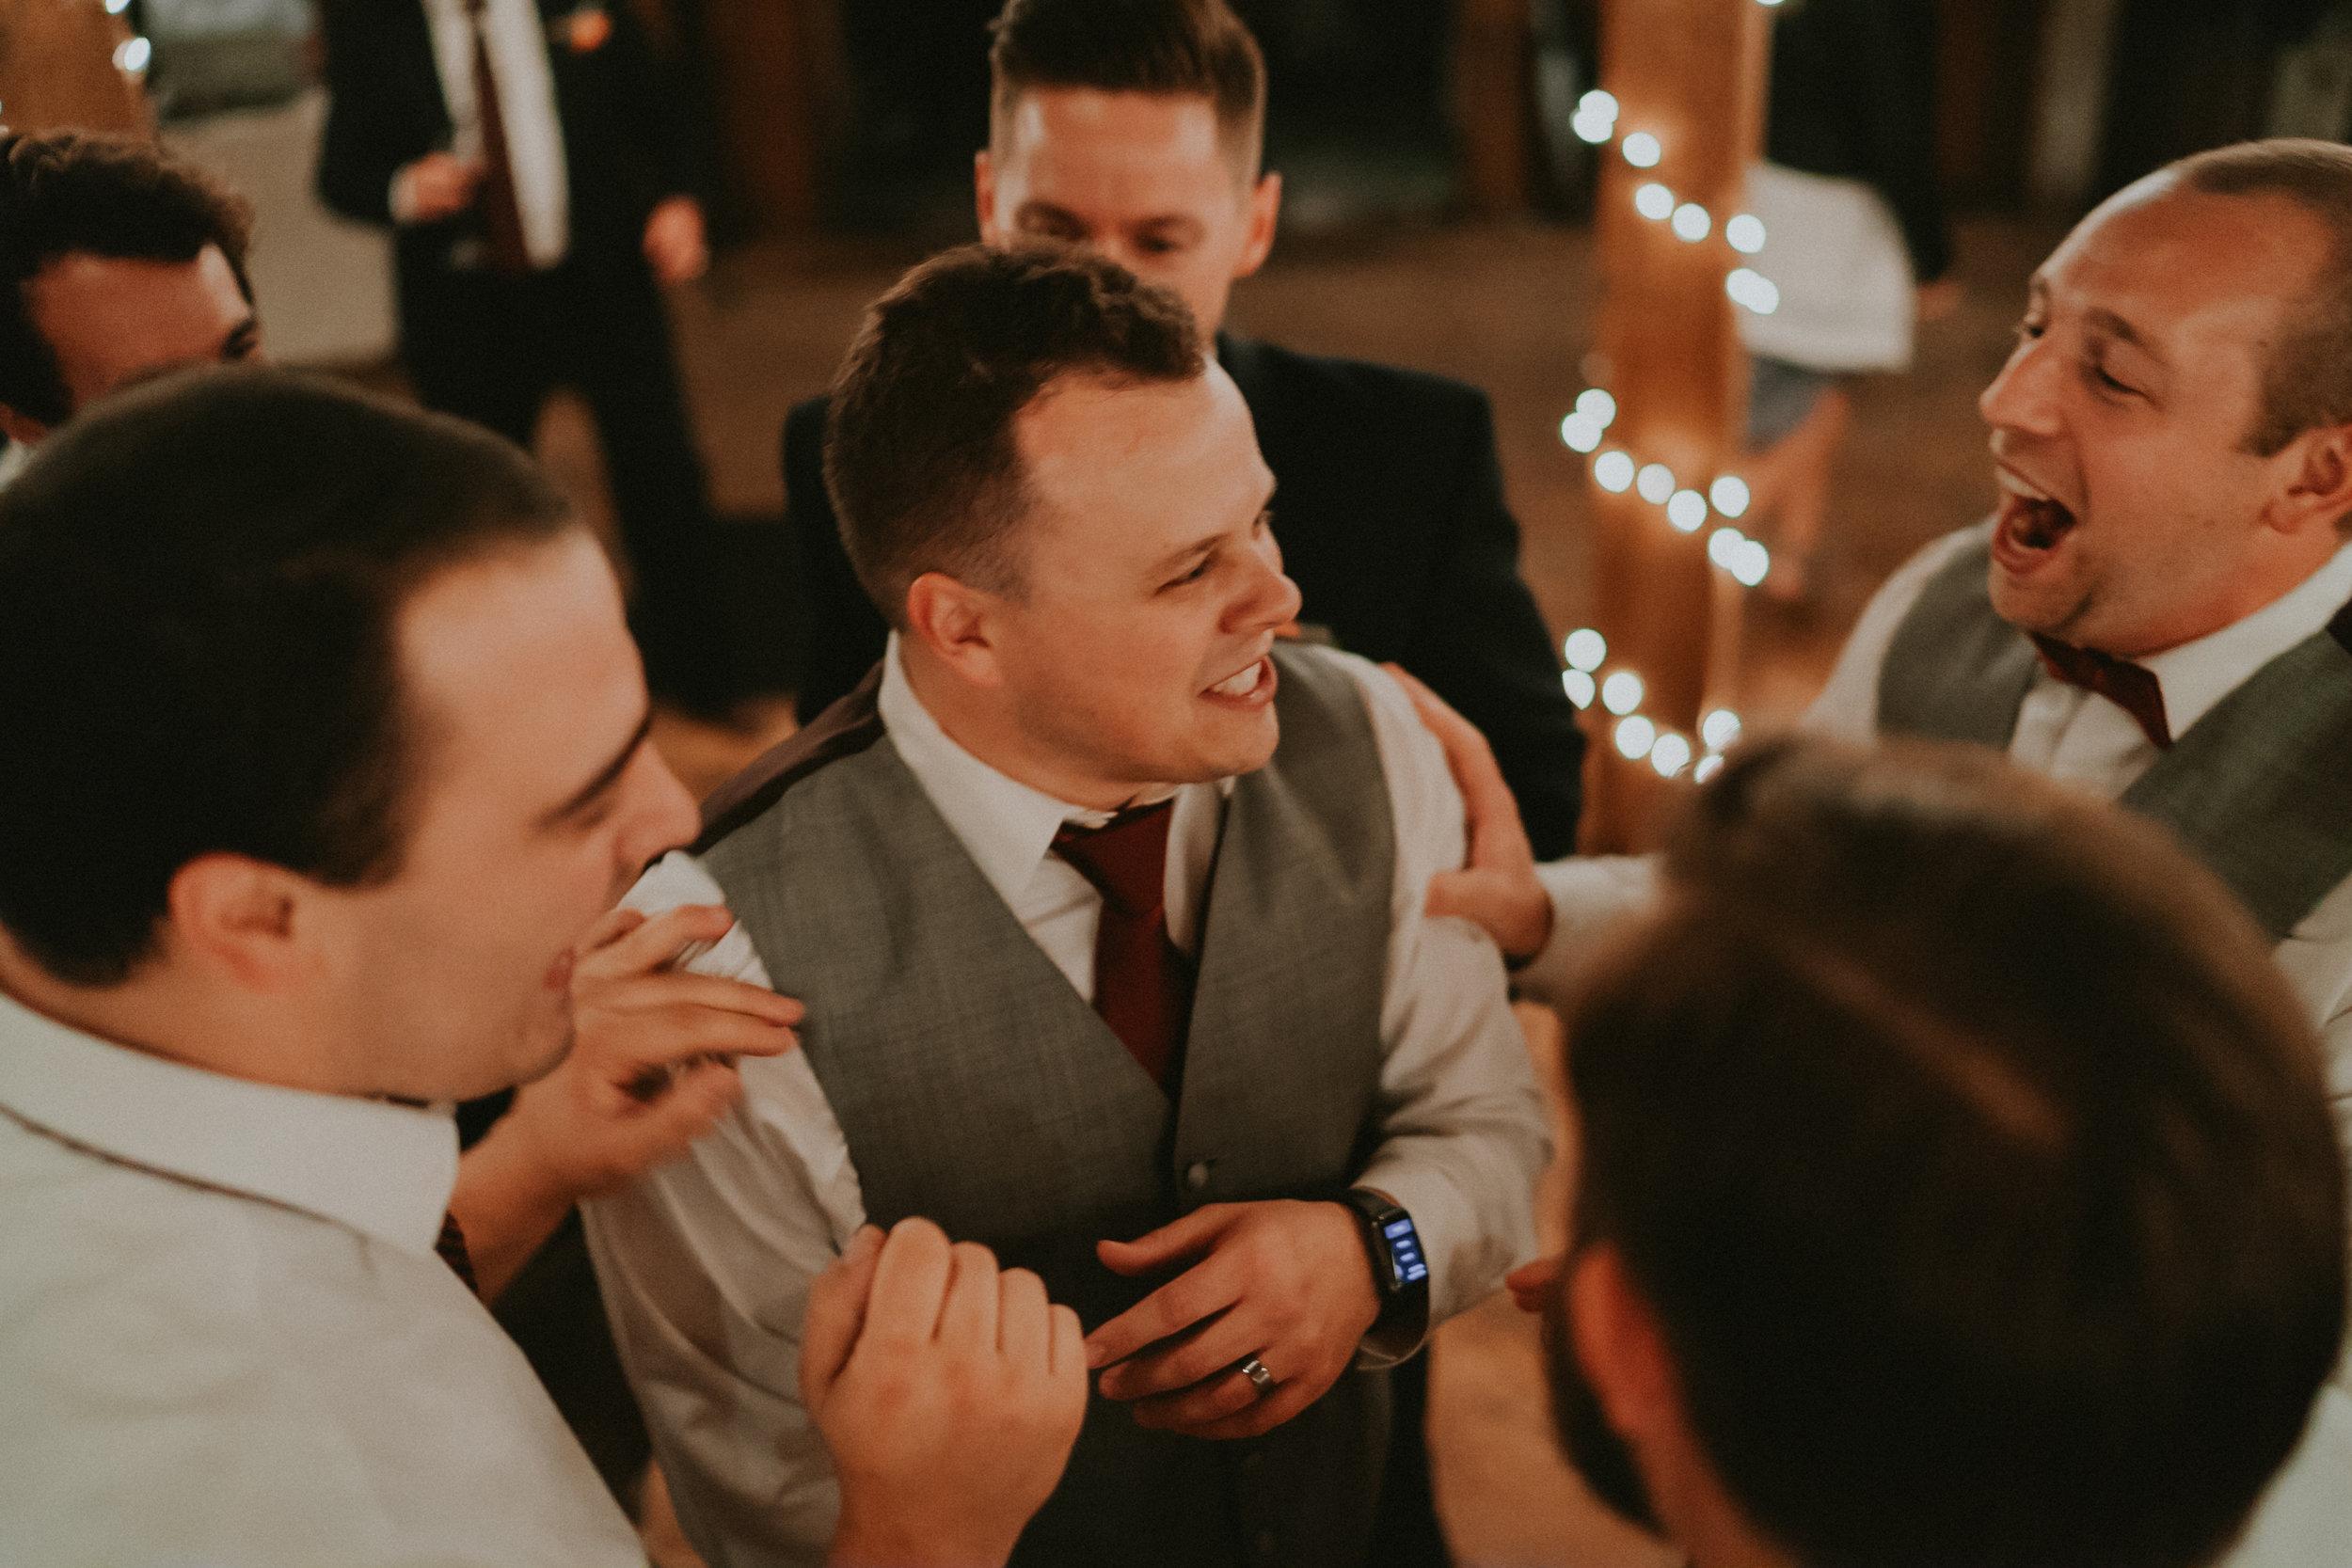 Portland_wedding_photographer_McMenamins_Alfred_Tang-104.jpg